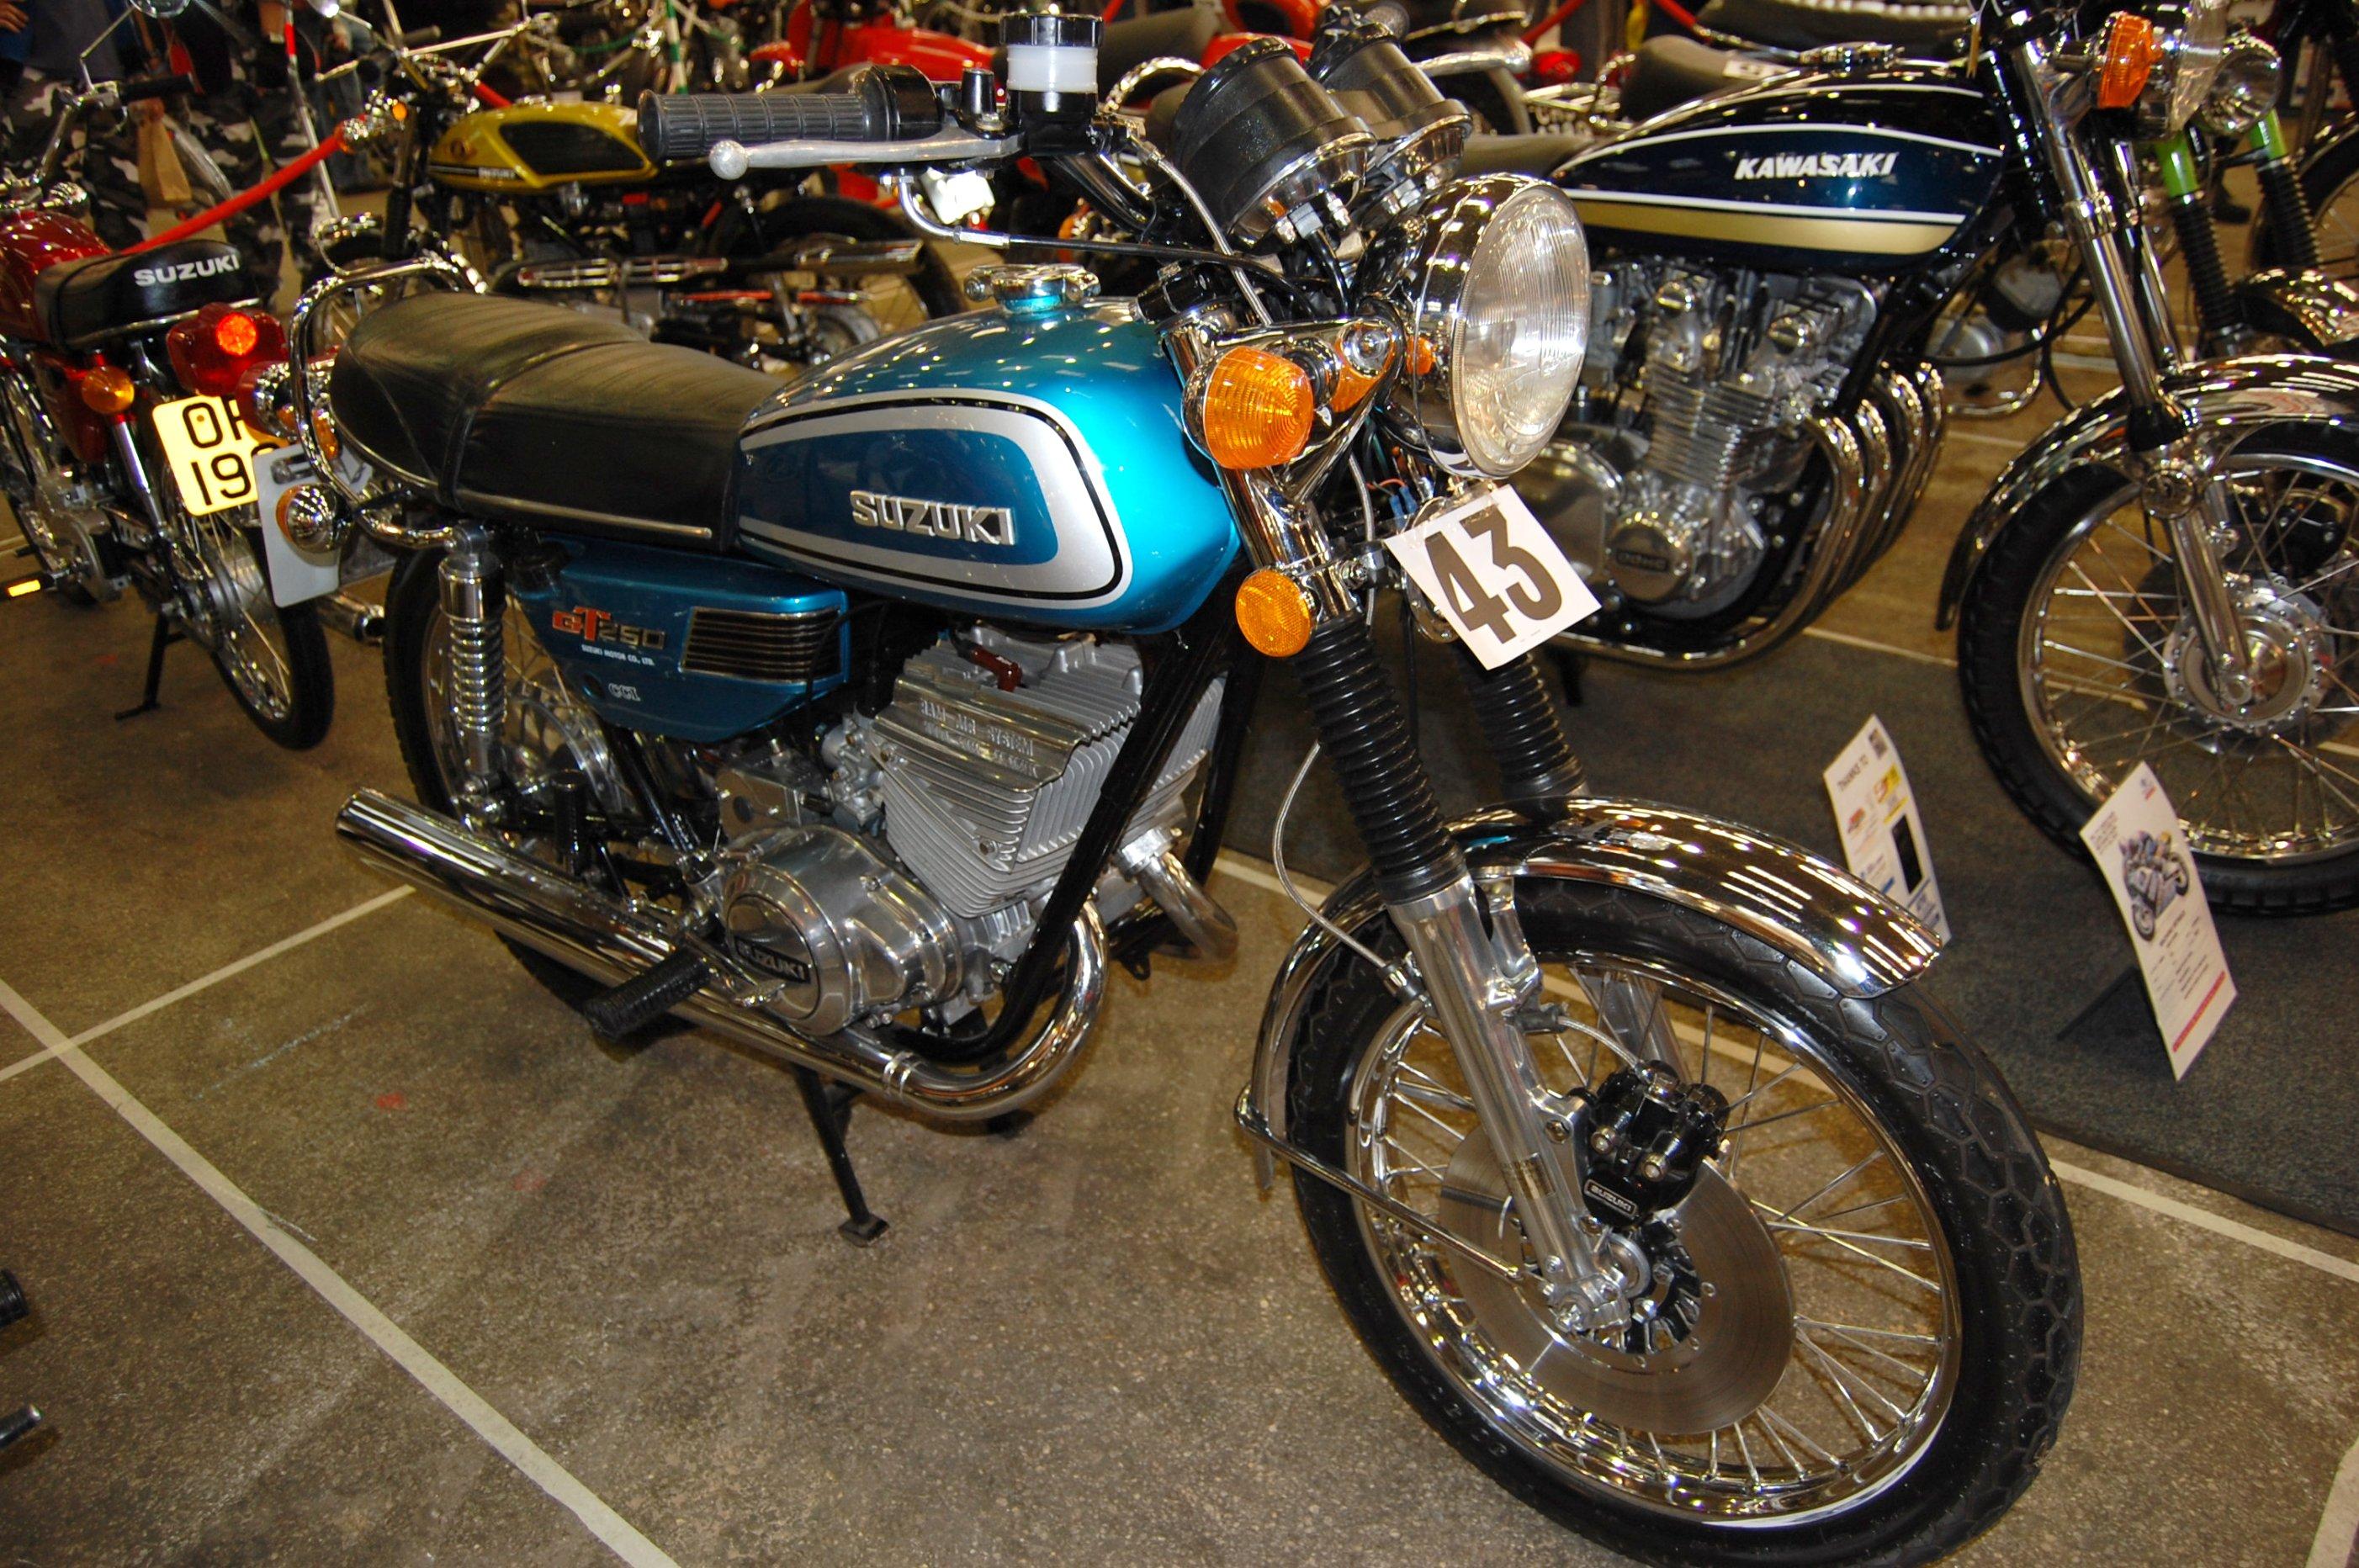 suzuki 250cc by file flickr ronsaunders47 suzuki gt250 250cc two stroke twin